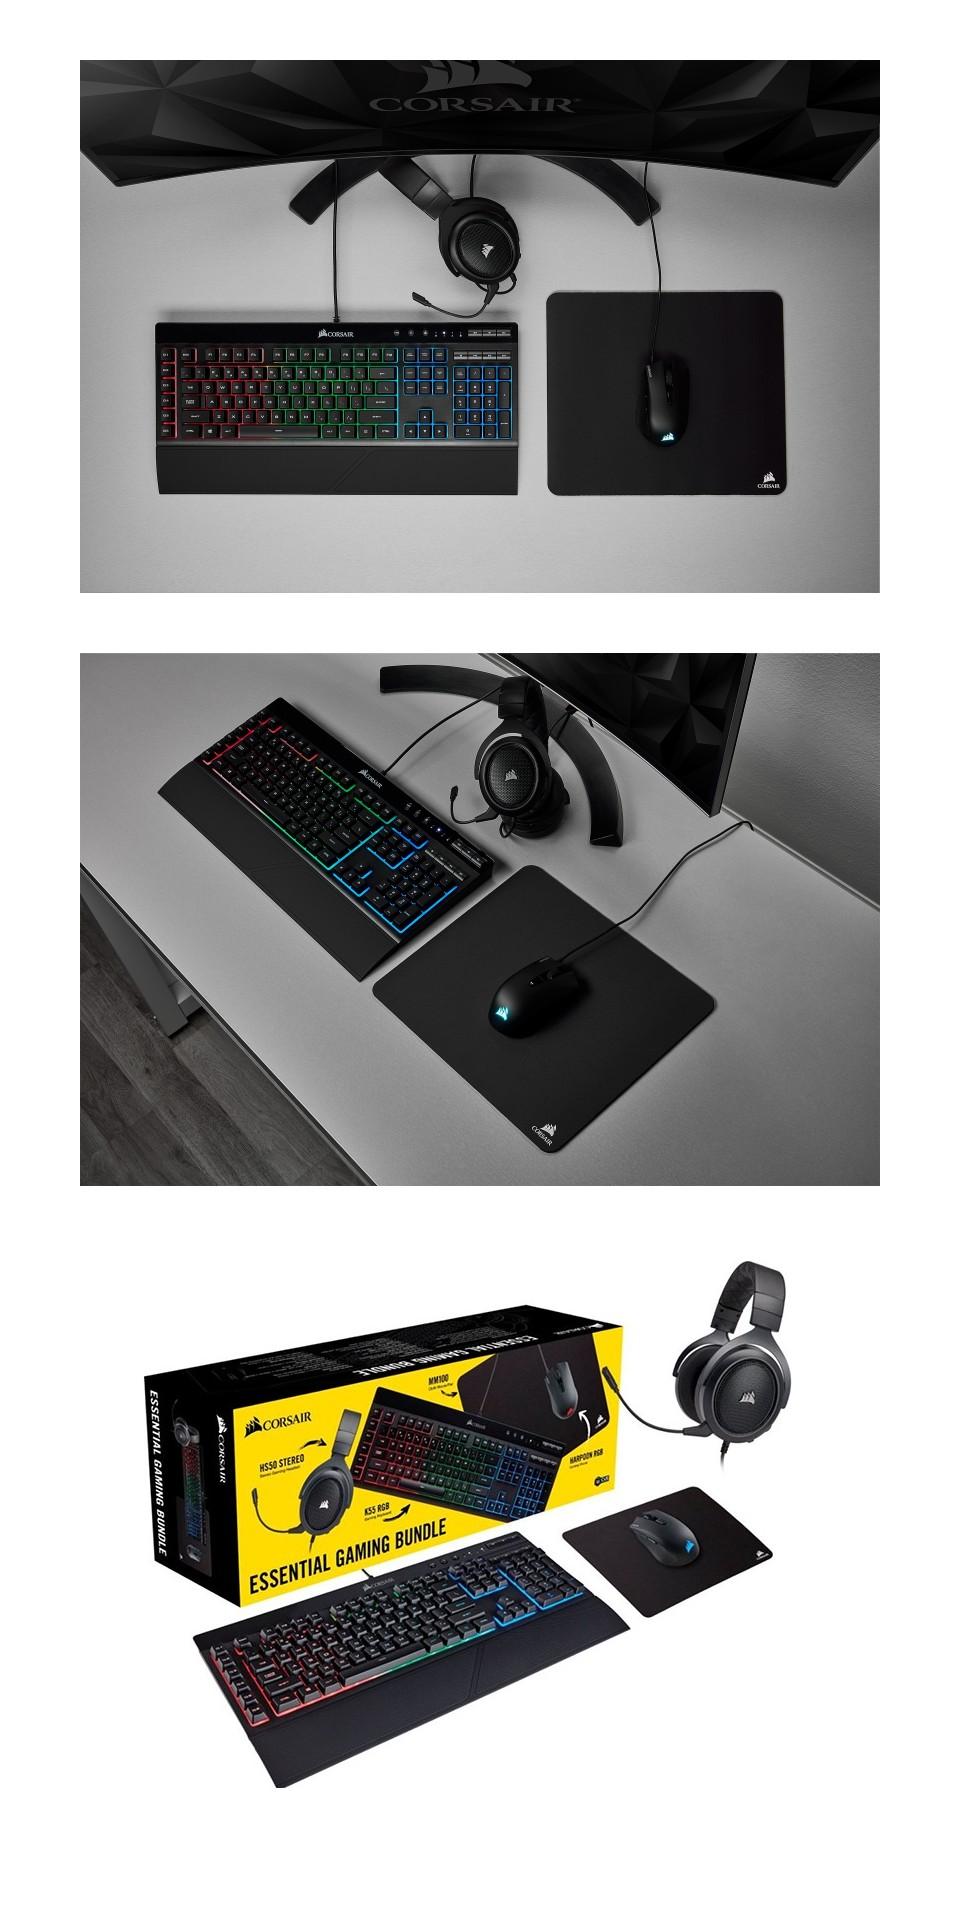 Corsair 4 in 1 Essential Gaming Bundle product